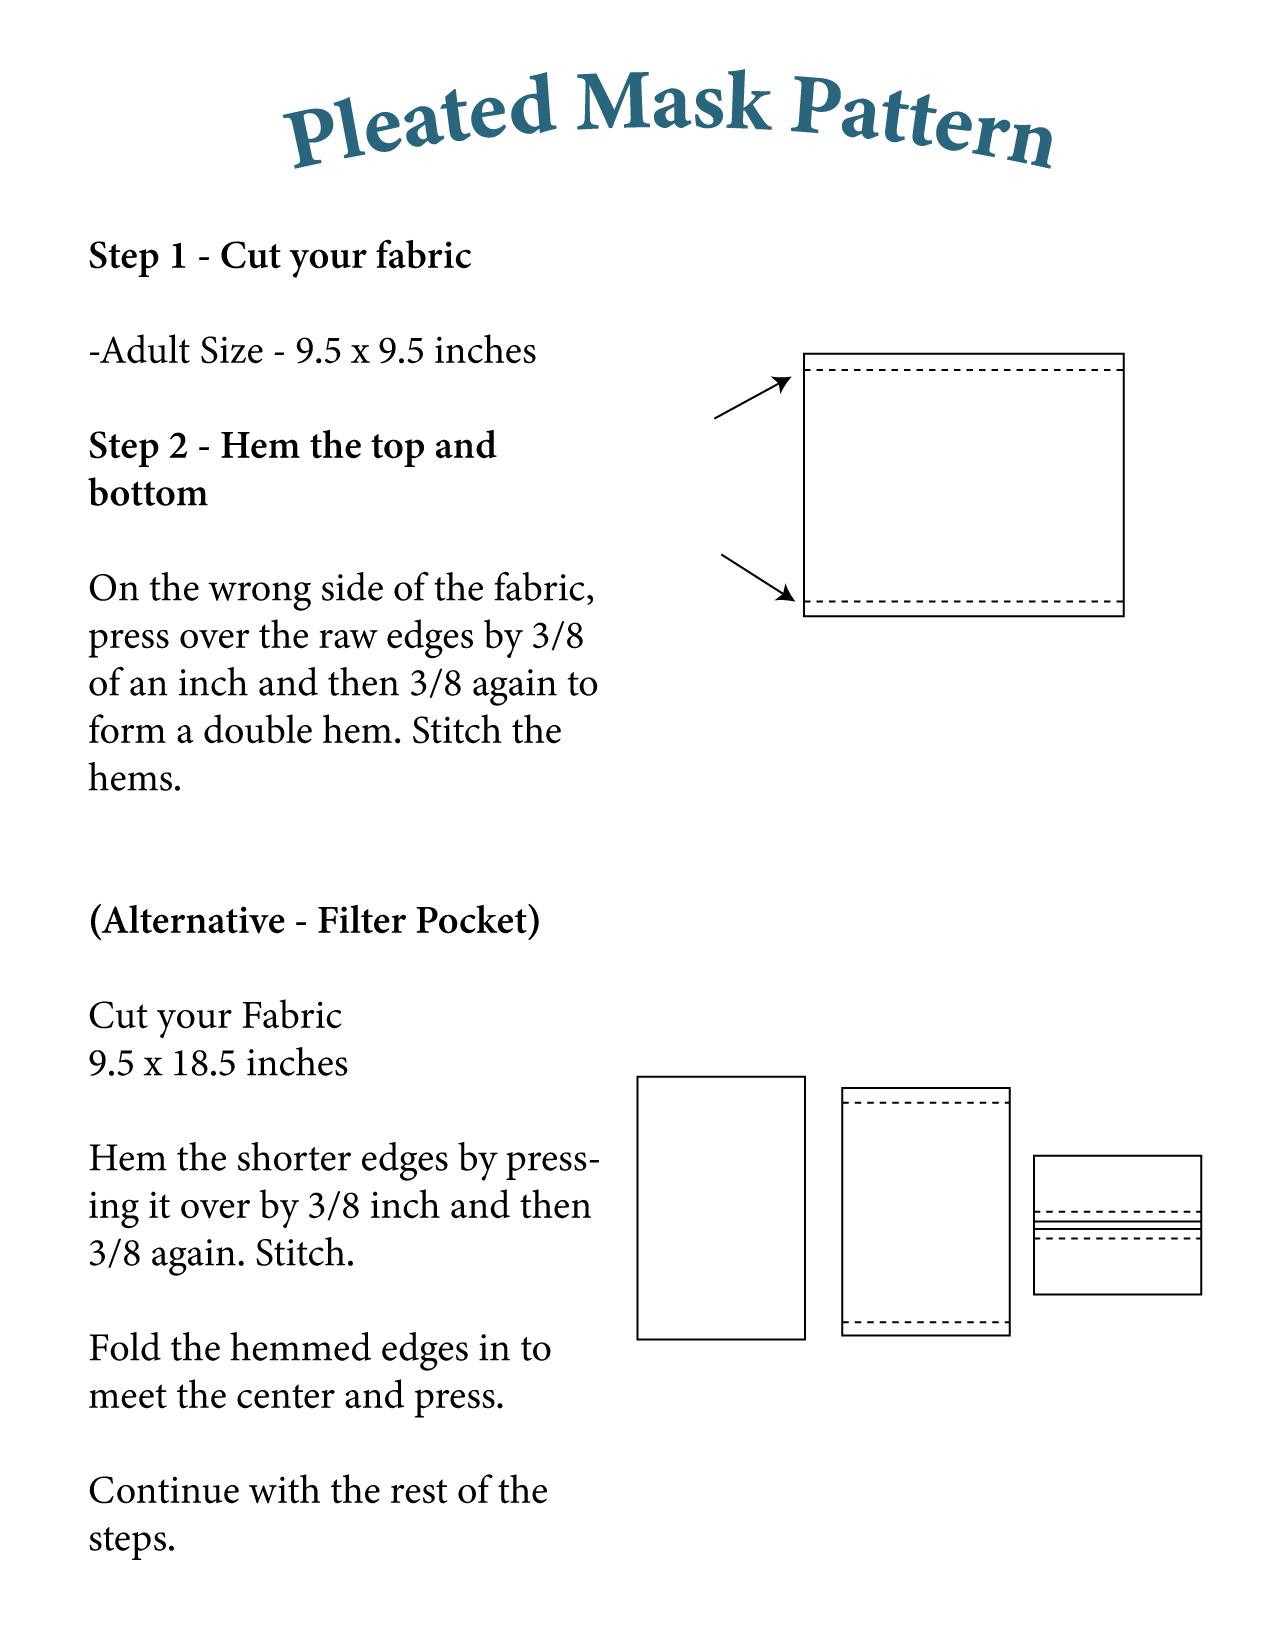 Pleated mask pattern